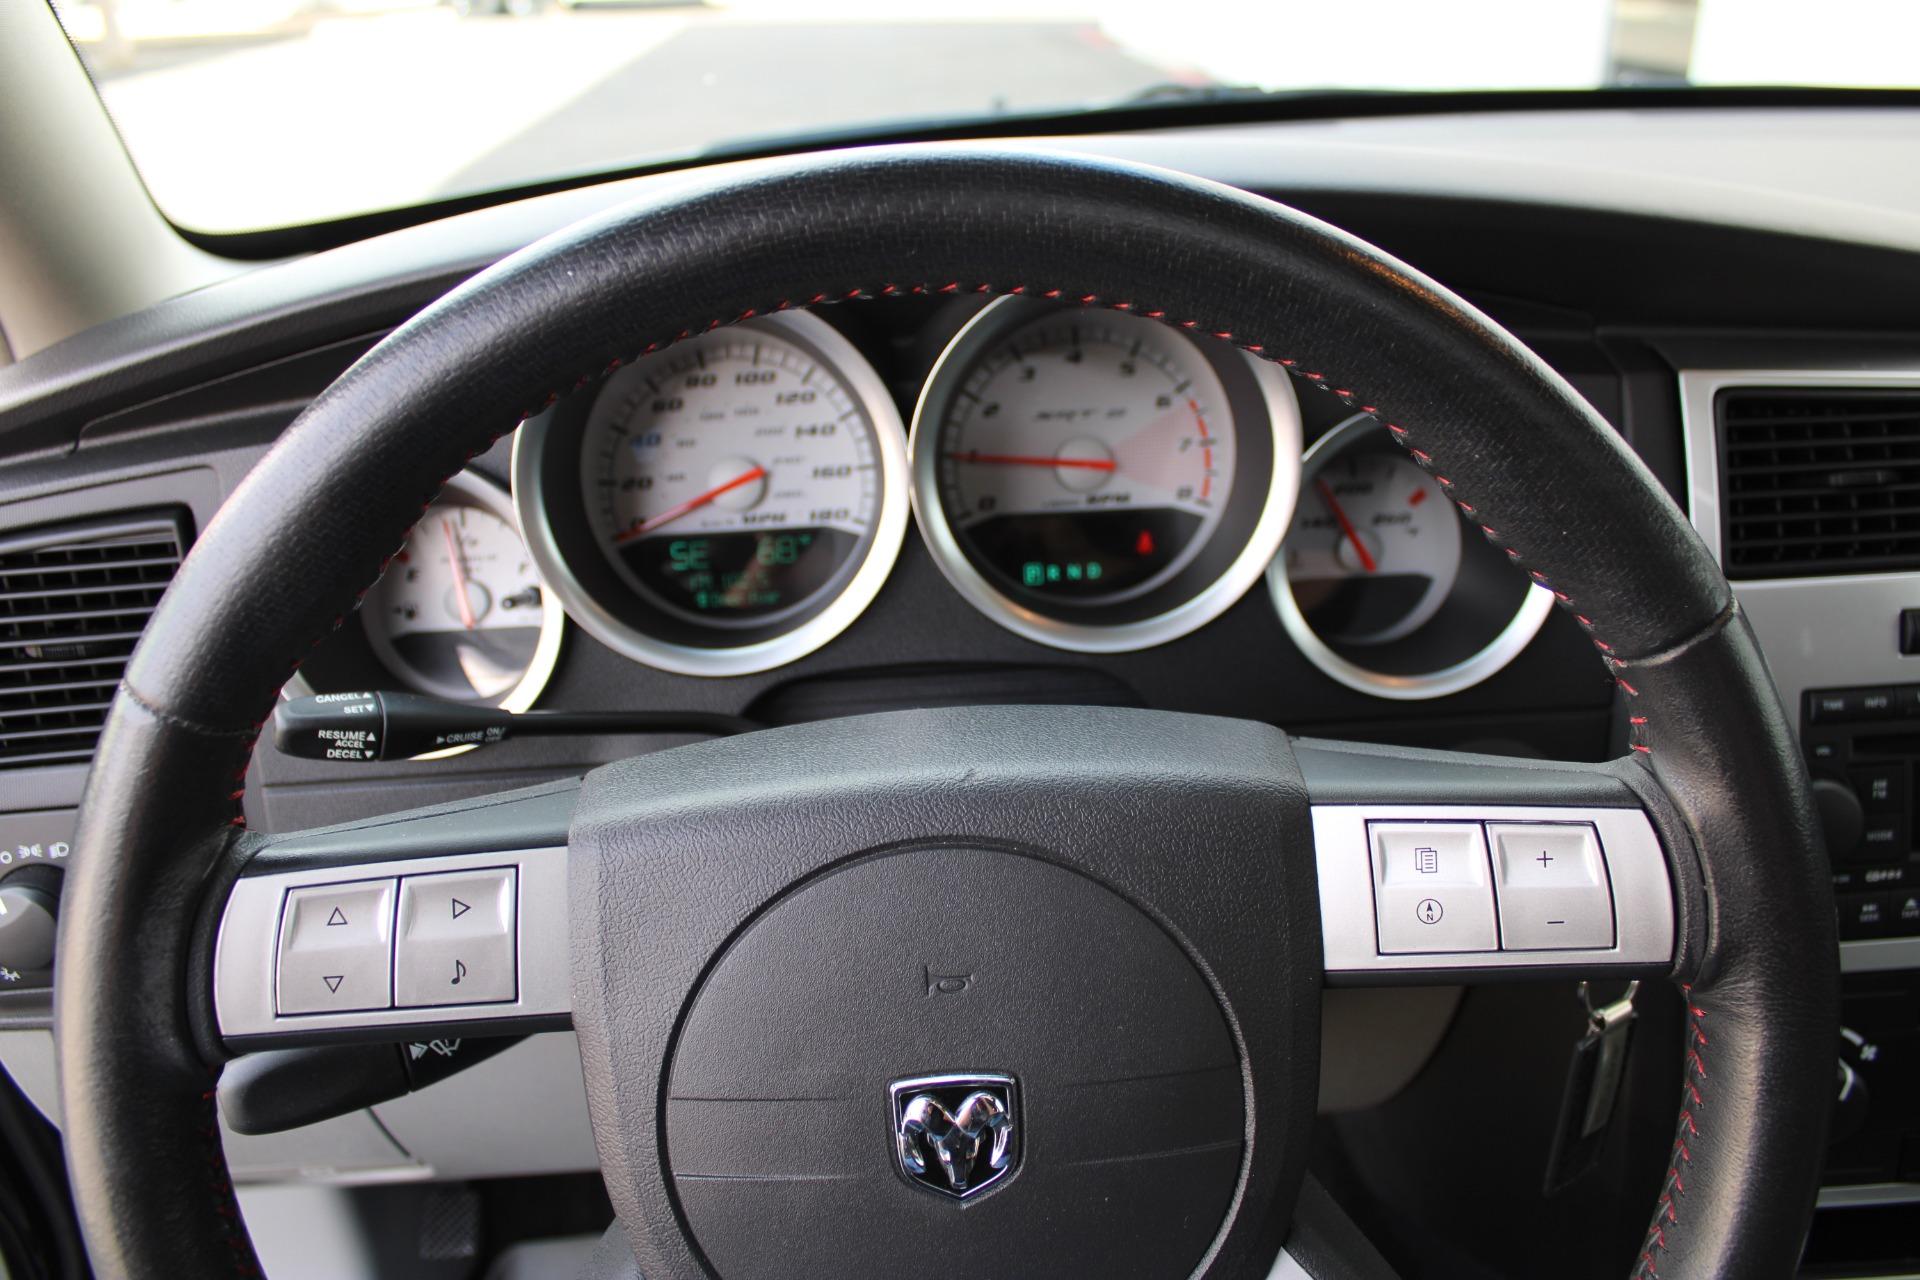 Used-2006-Dodge-Magnum-SRT8-Porsche